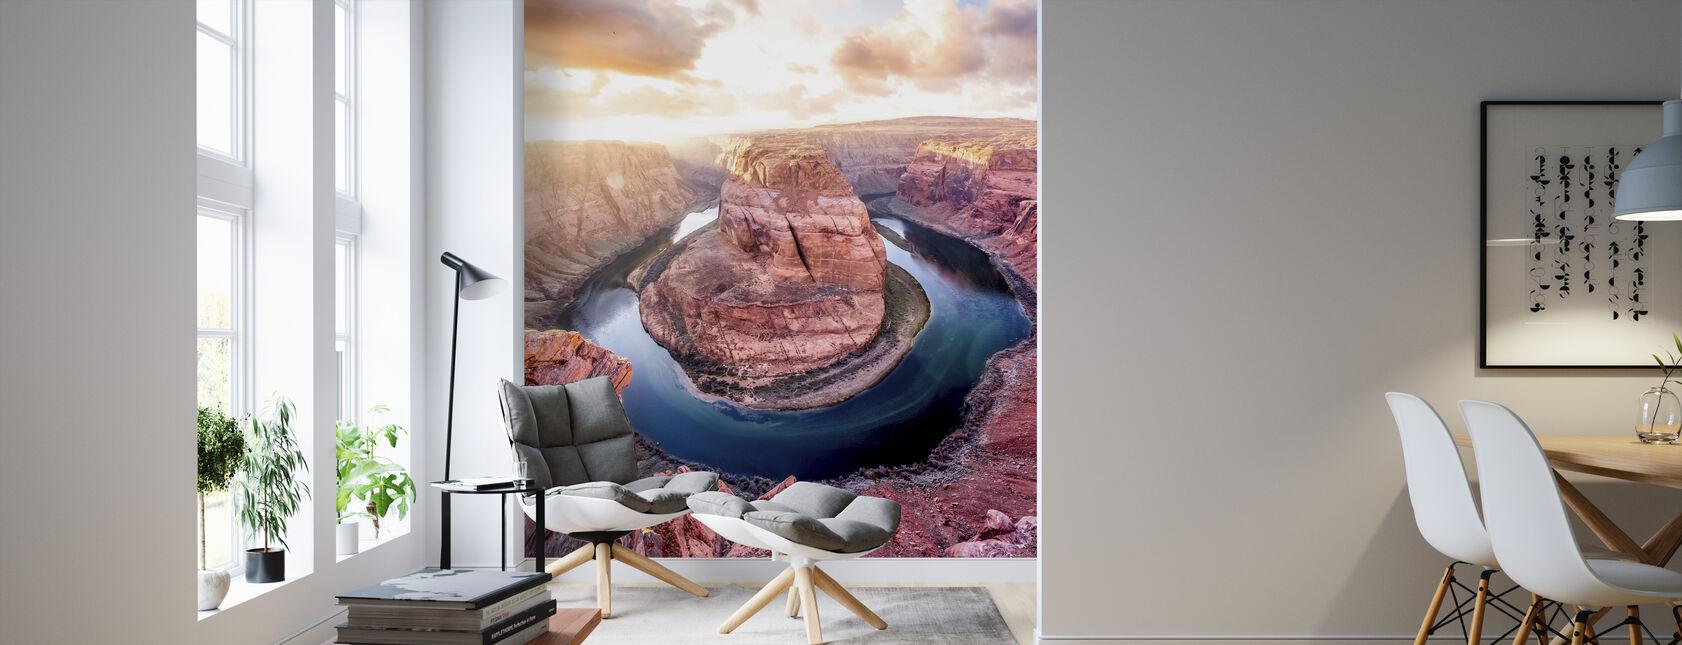 Arizona Canyon - Wallpaper - Living Room